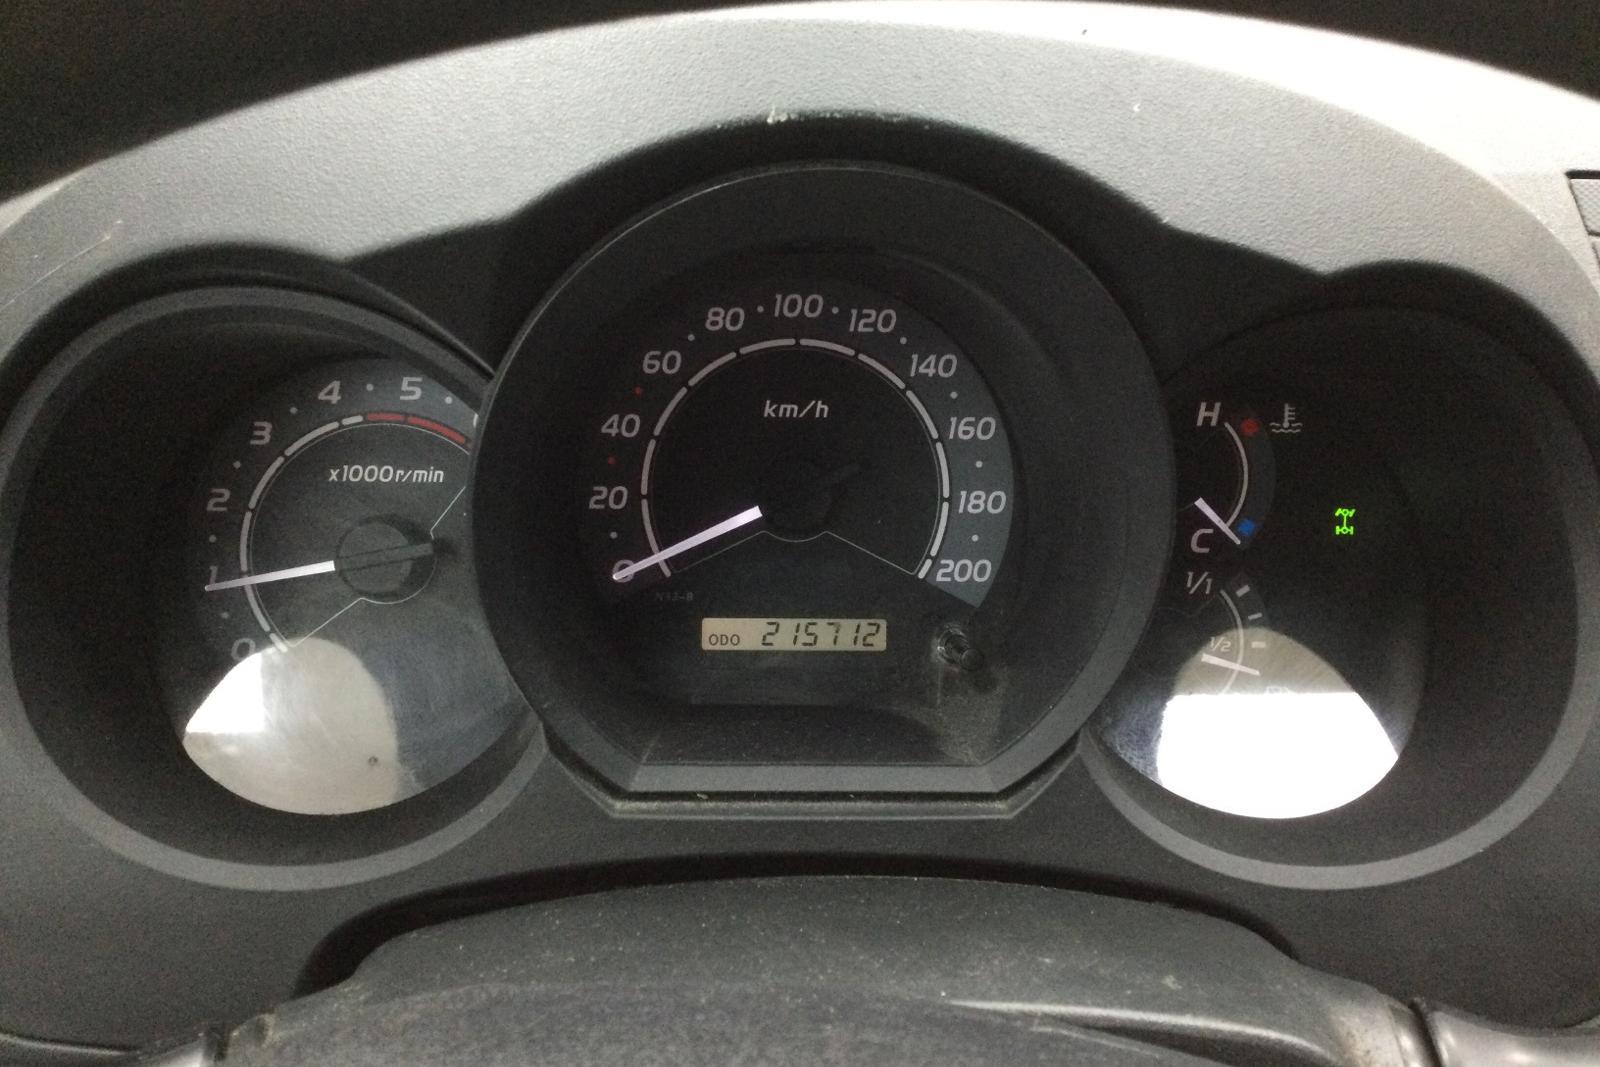 Toyota Hilux 2.5 D-4D 4WD (144hk) - 215 710 km - Manual - white - 2011